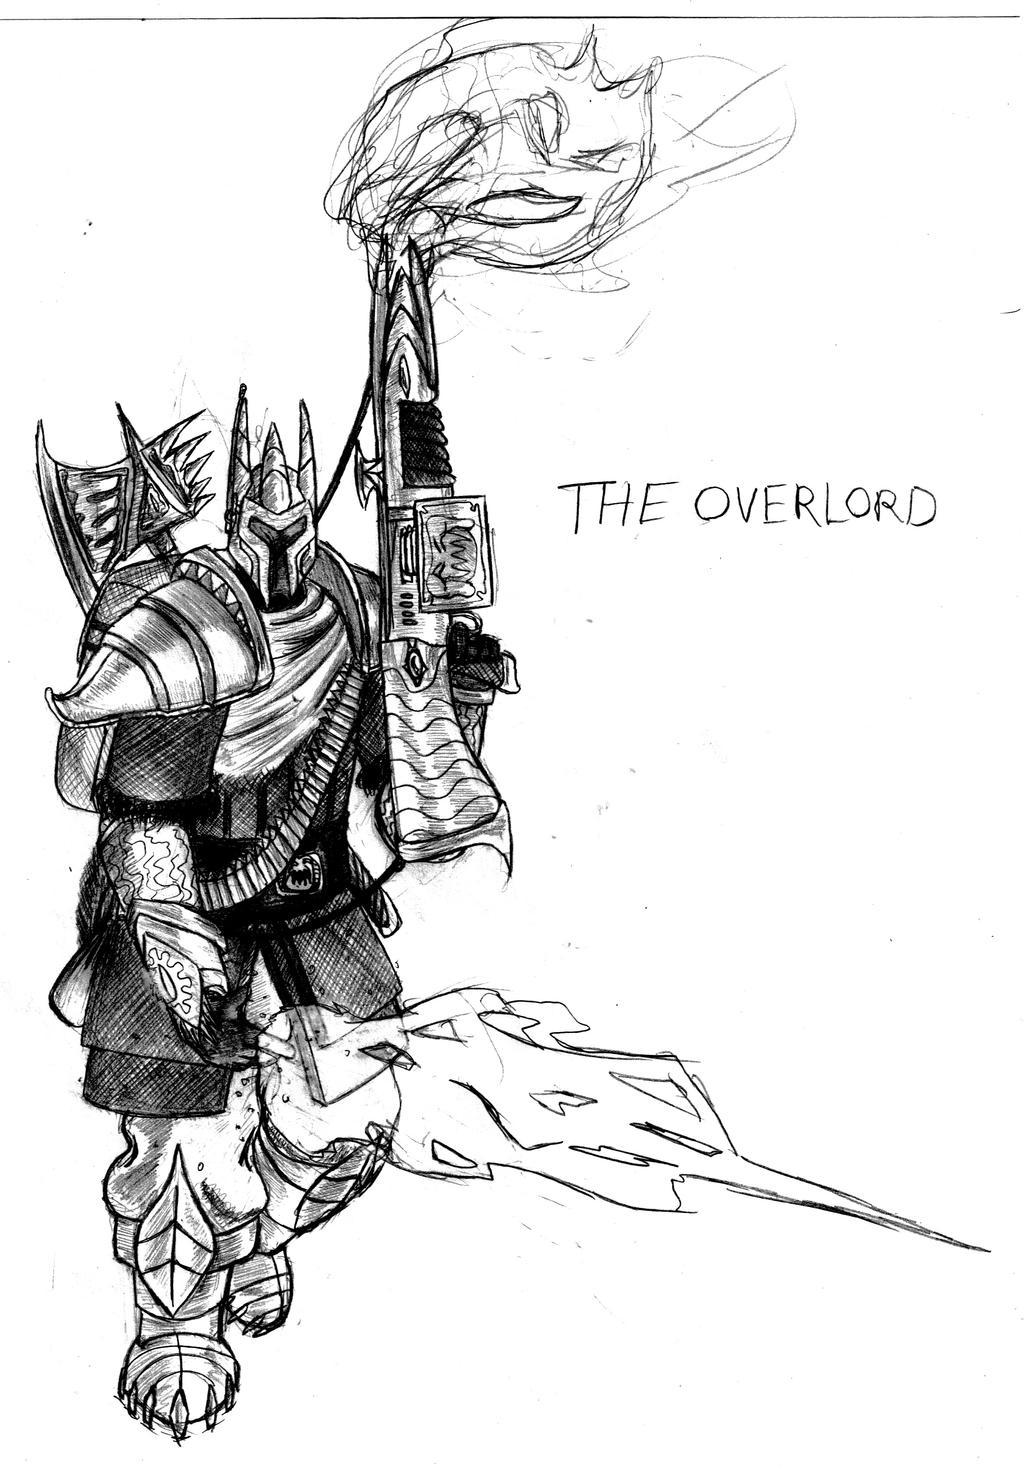 Overlord, modernized by Jesseearlswift